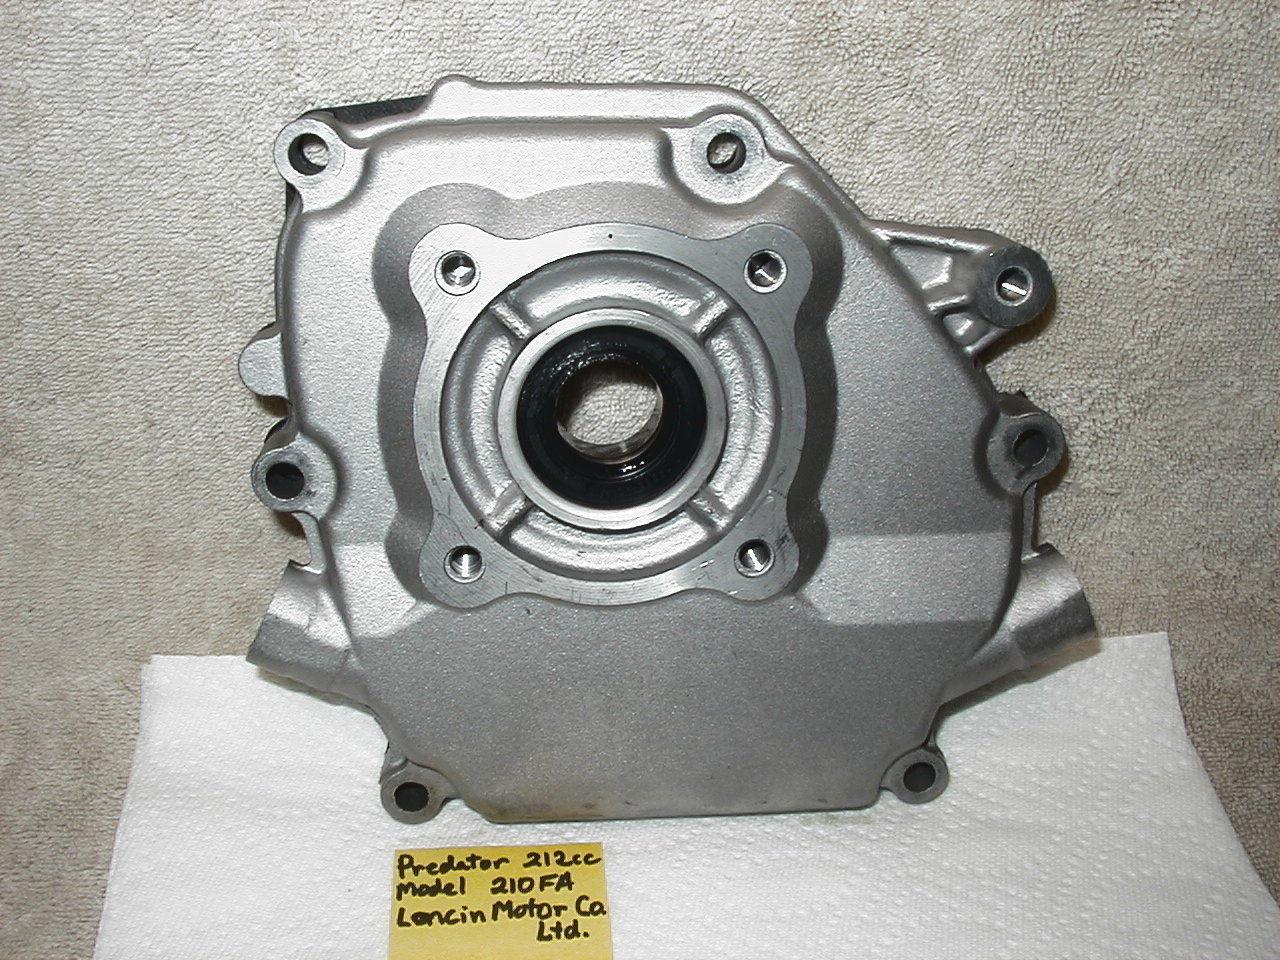 predator 212 cc carburetor diagram predator free engine image for user manual